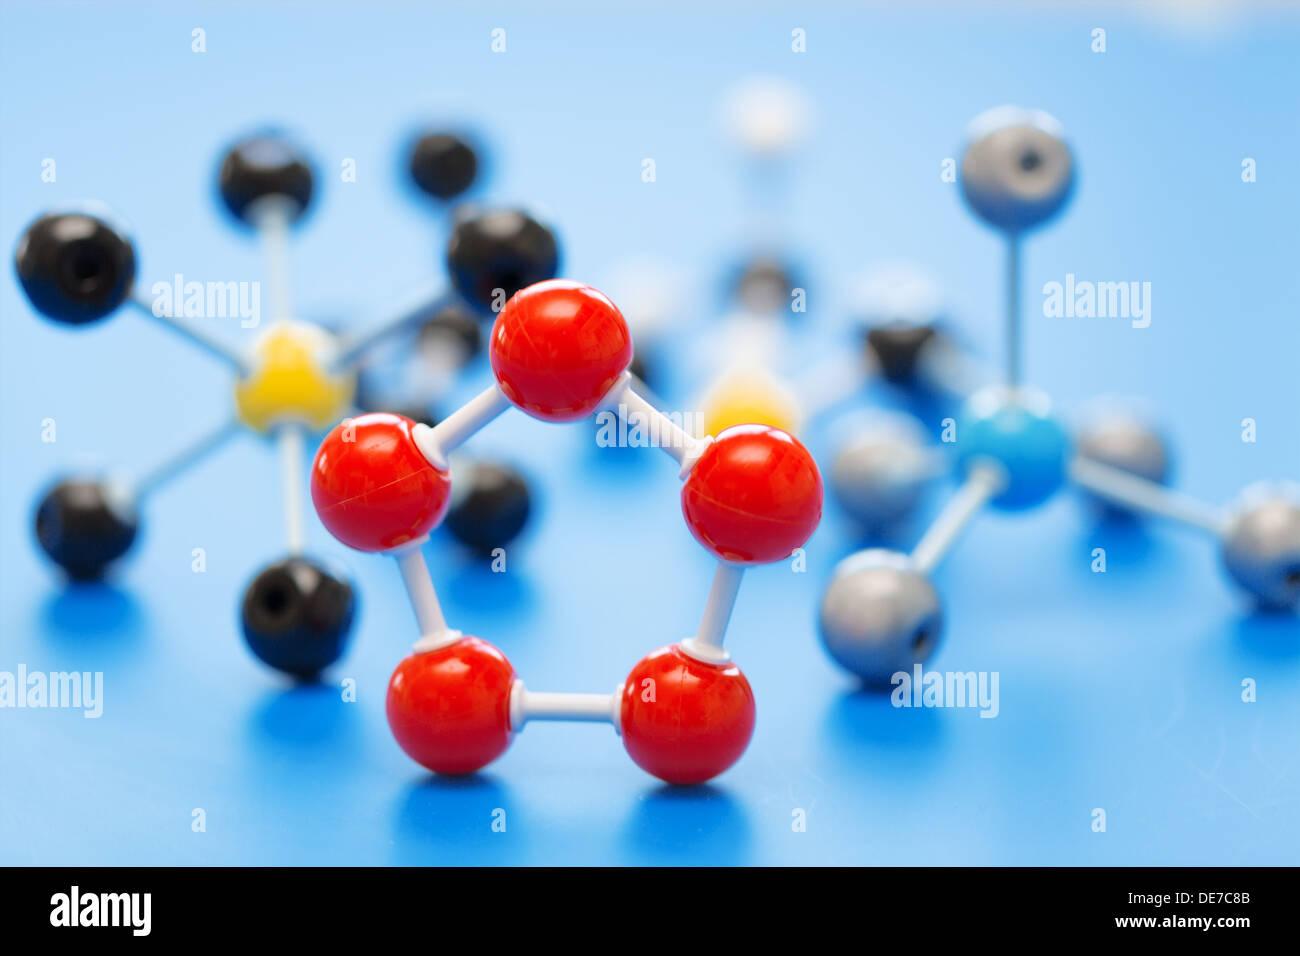 model of chemical molecule - Stock Image